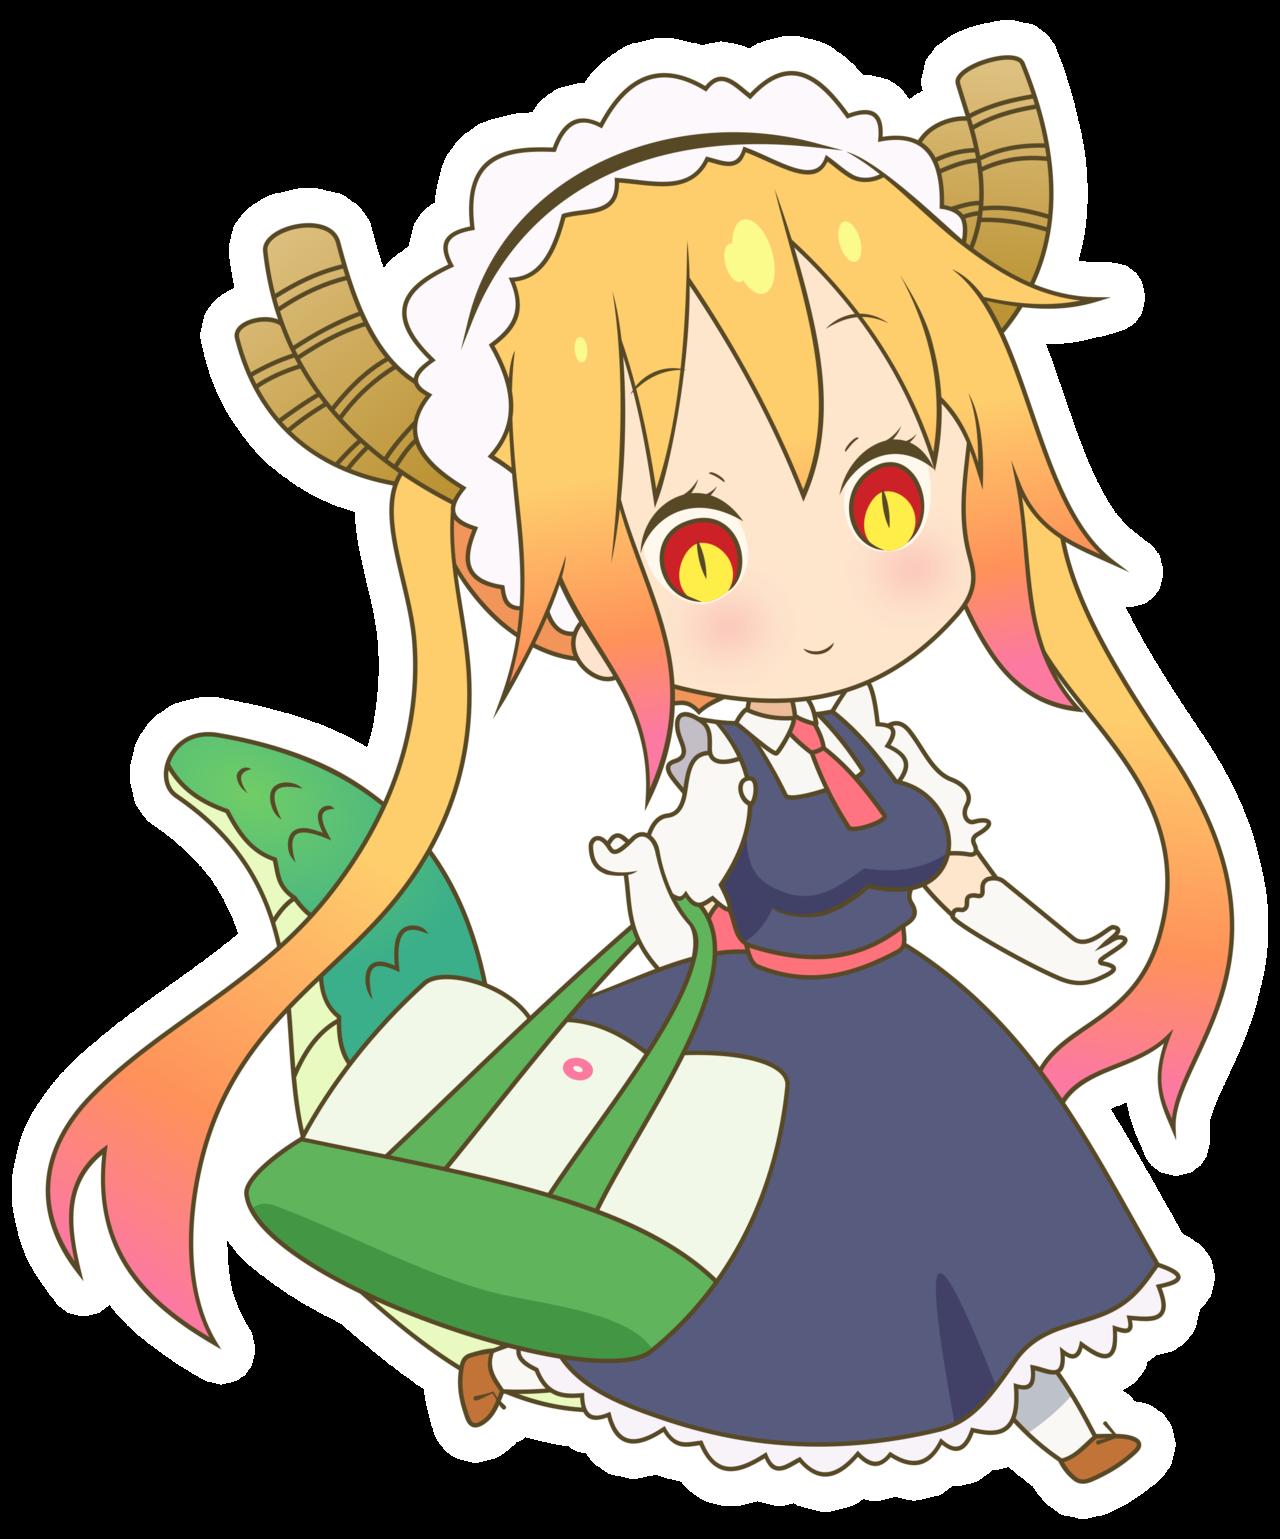 Maid clipart stick figure. Tooru by rosalyneres kobayashi